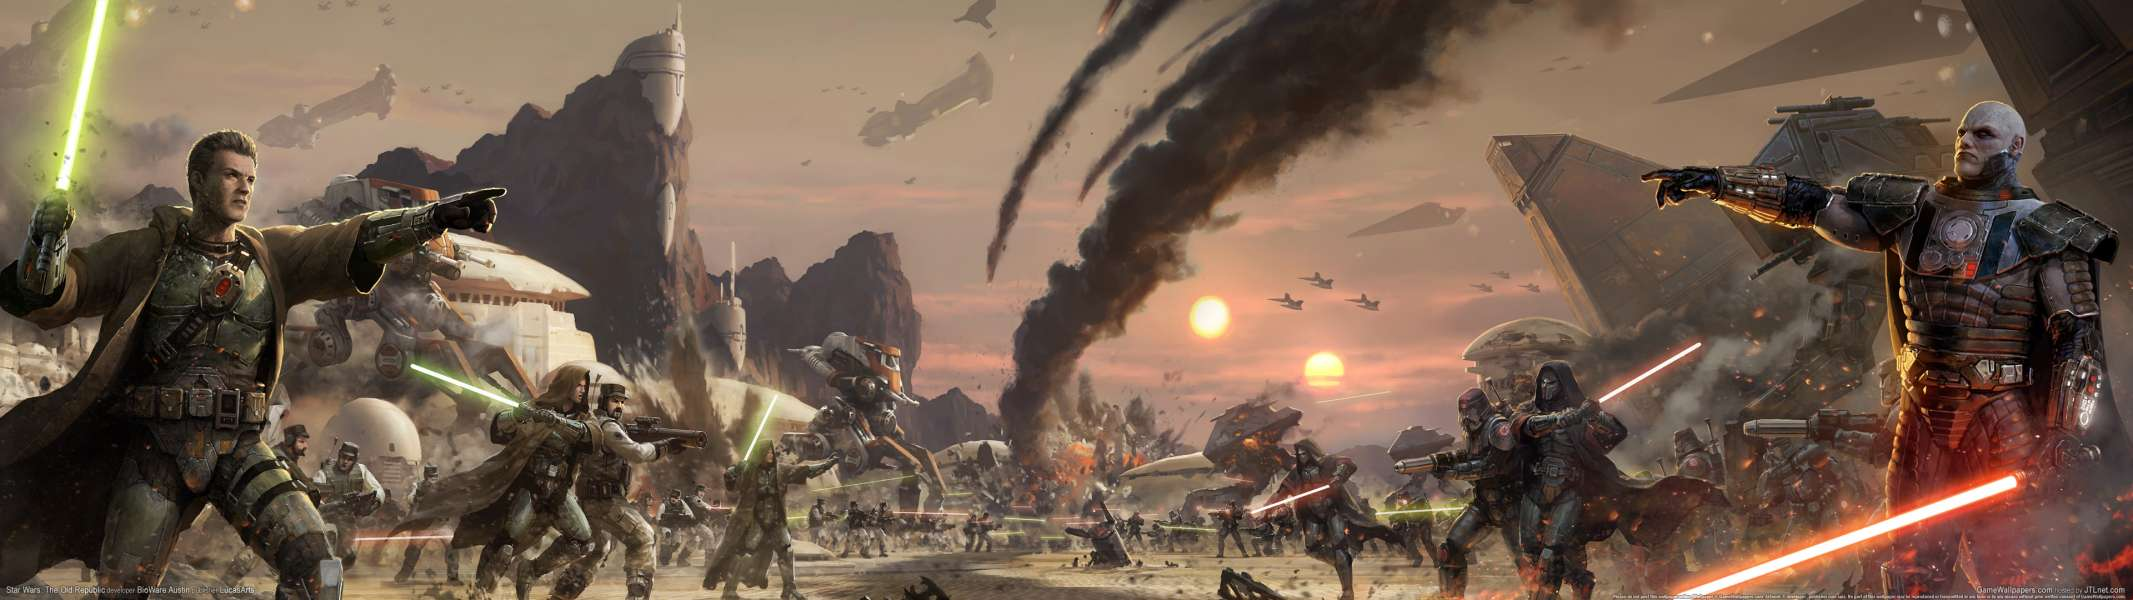 Star Wars Dual Screen Wallpapers Top Free Star Wars Dual Screen Backgrounds Wallpaperaccess